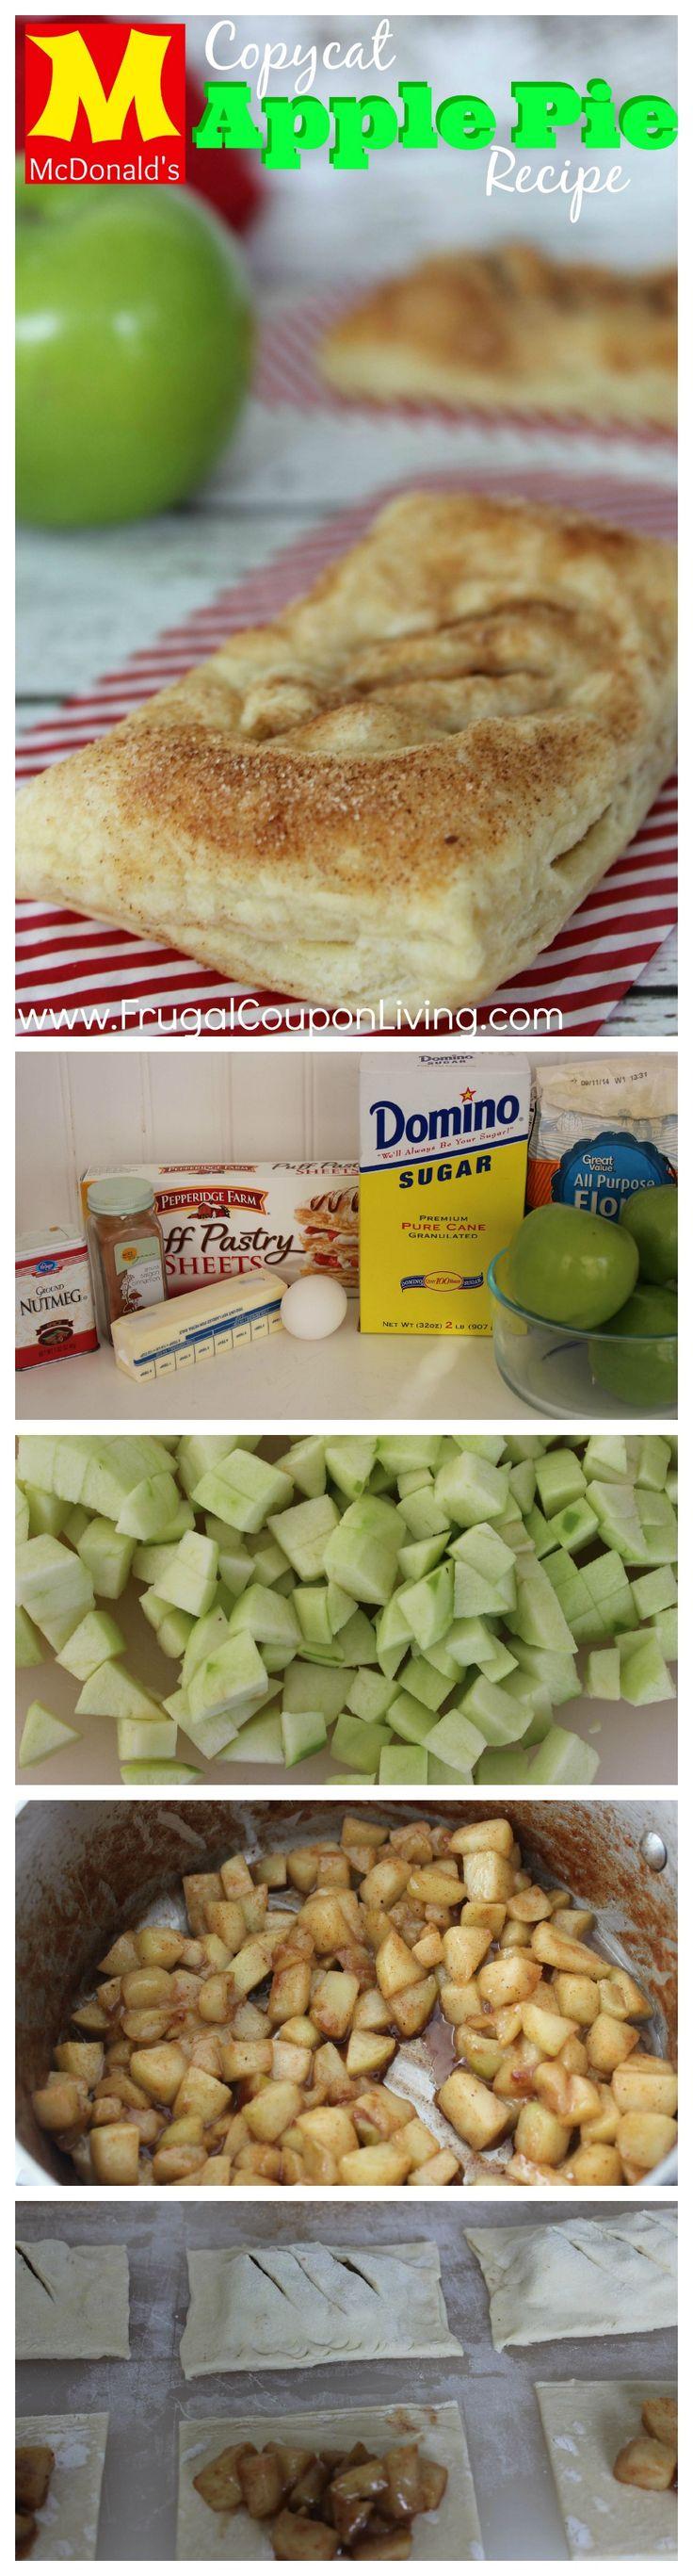 Copycat McDonald's Apple Pie Recipe – Baked Cinnamon Dessert #copycat #recipe #mcdonalds #apple #applepie #cinnamon #dessert #copycatrecipe http://www.frugalcouponliving.com/2014/07/06/copycat-mcdonalds-apple-pie-recipe/